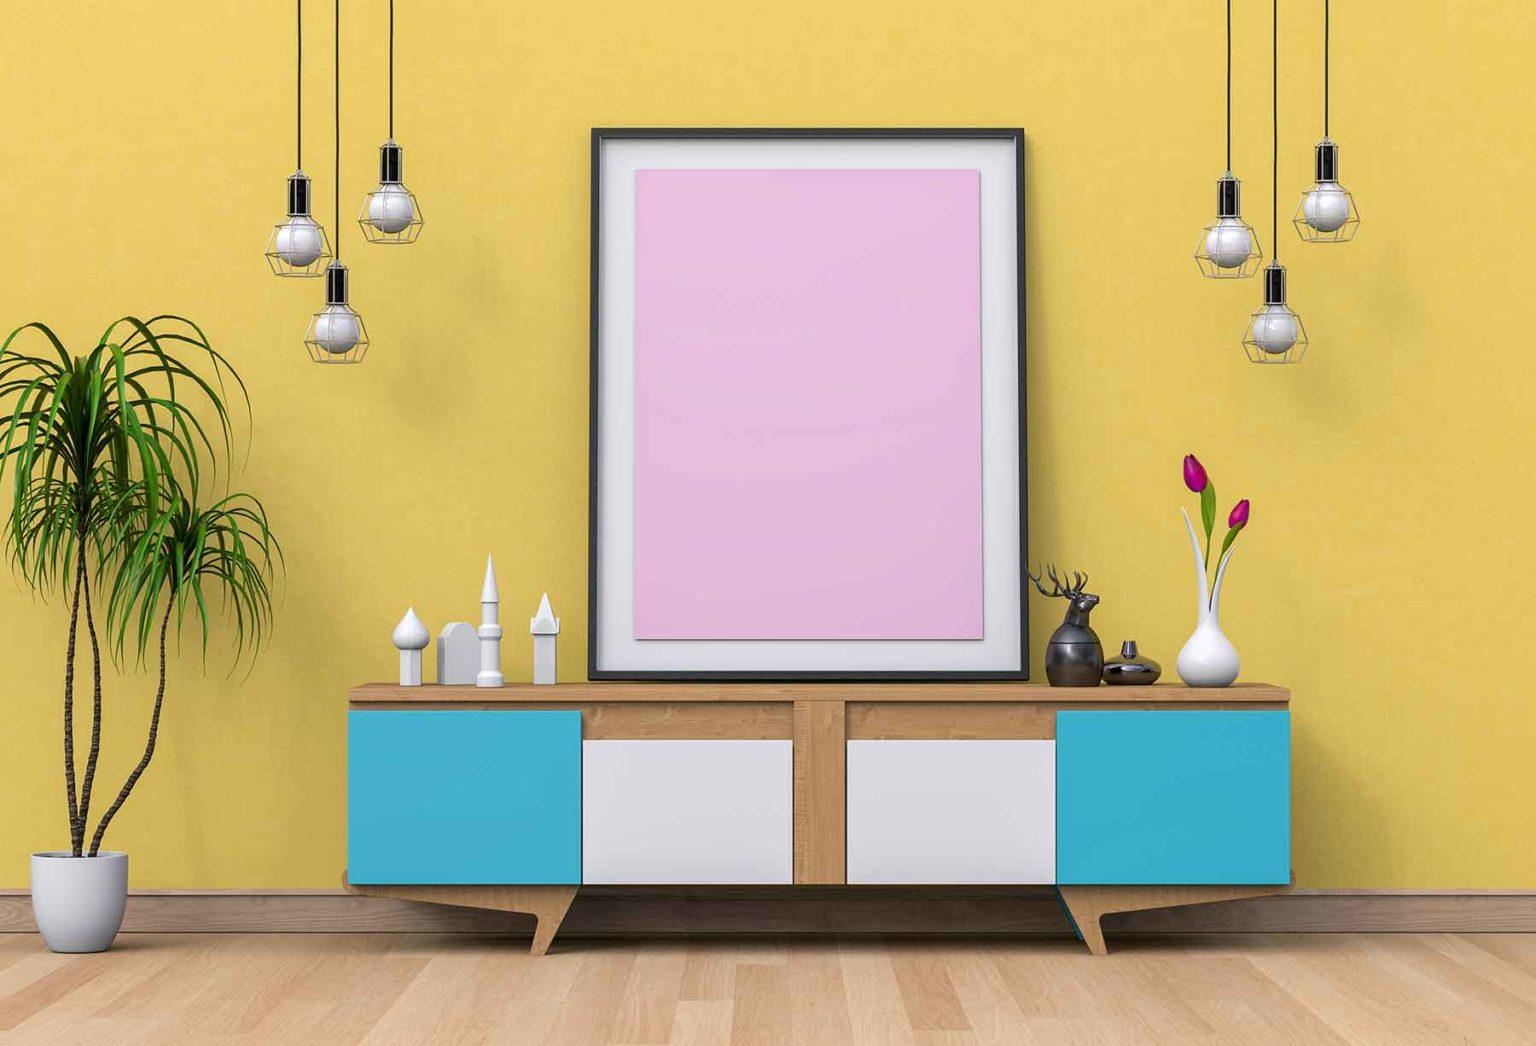 interior-living-room-with-sideboard-and-mockup-bla-HD9NJQR.jpg